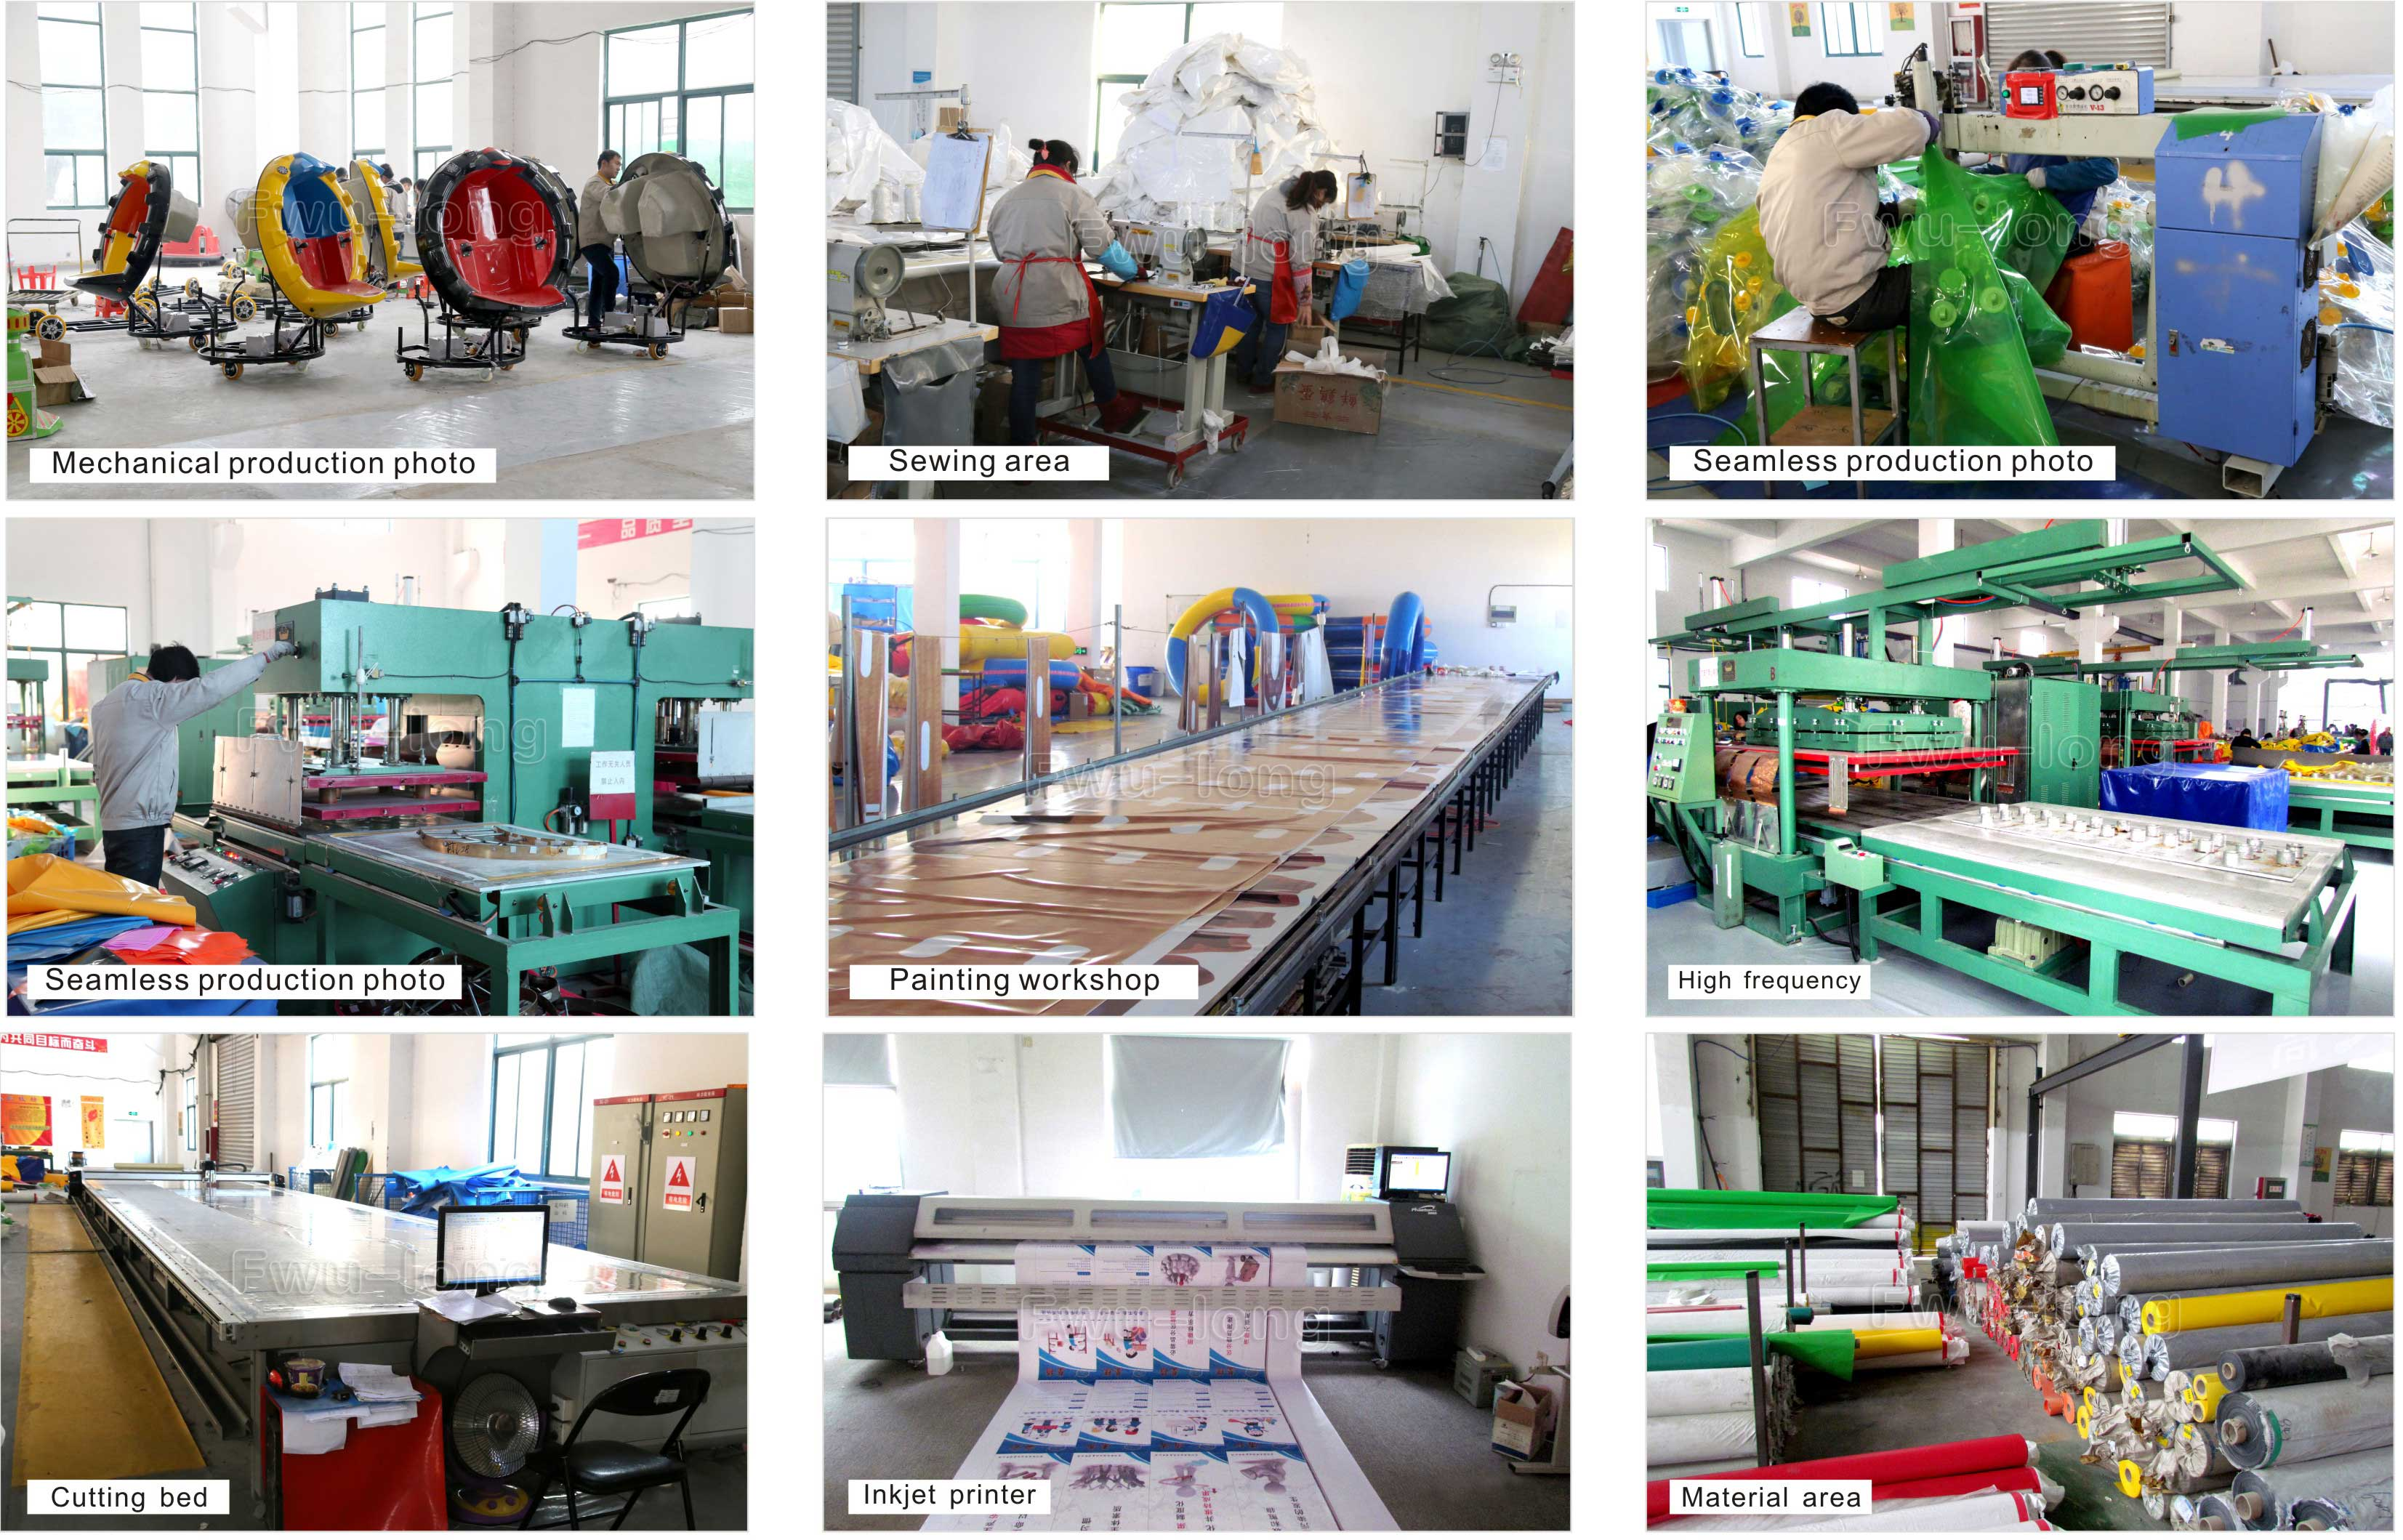 fwu-long factory